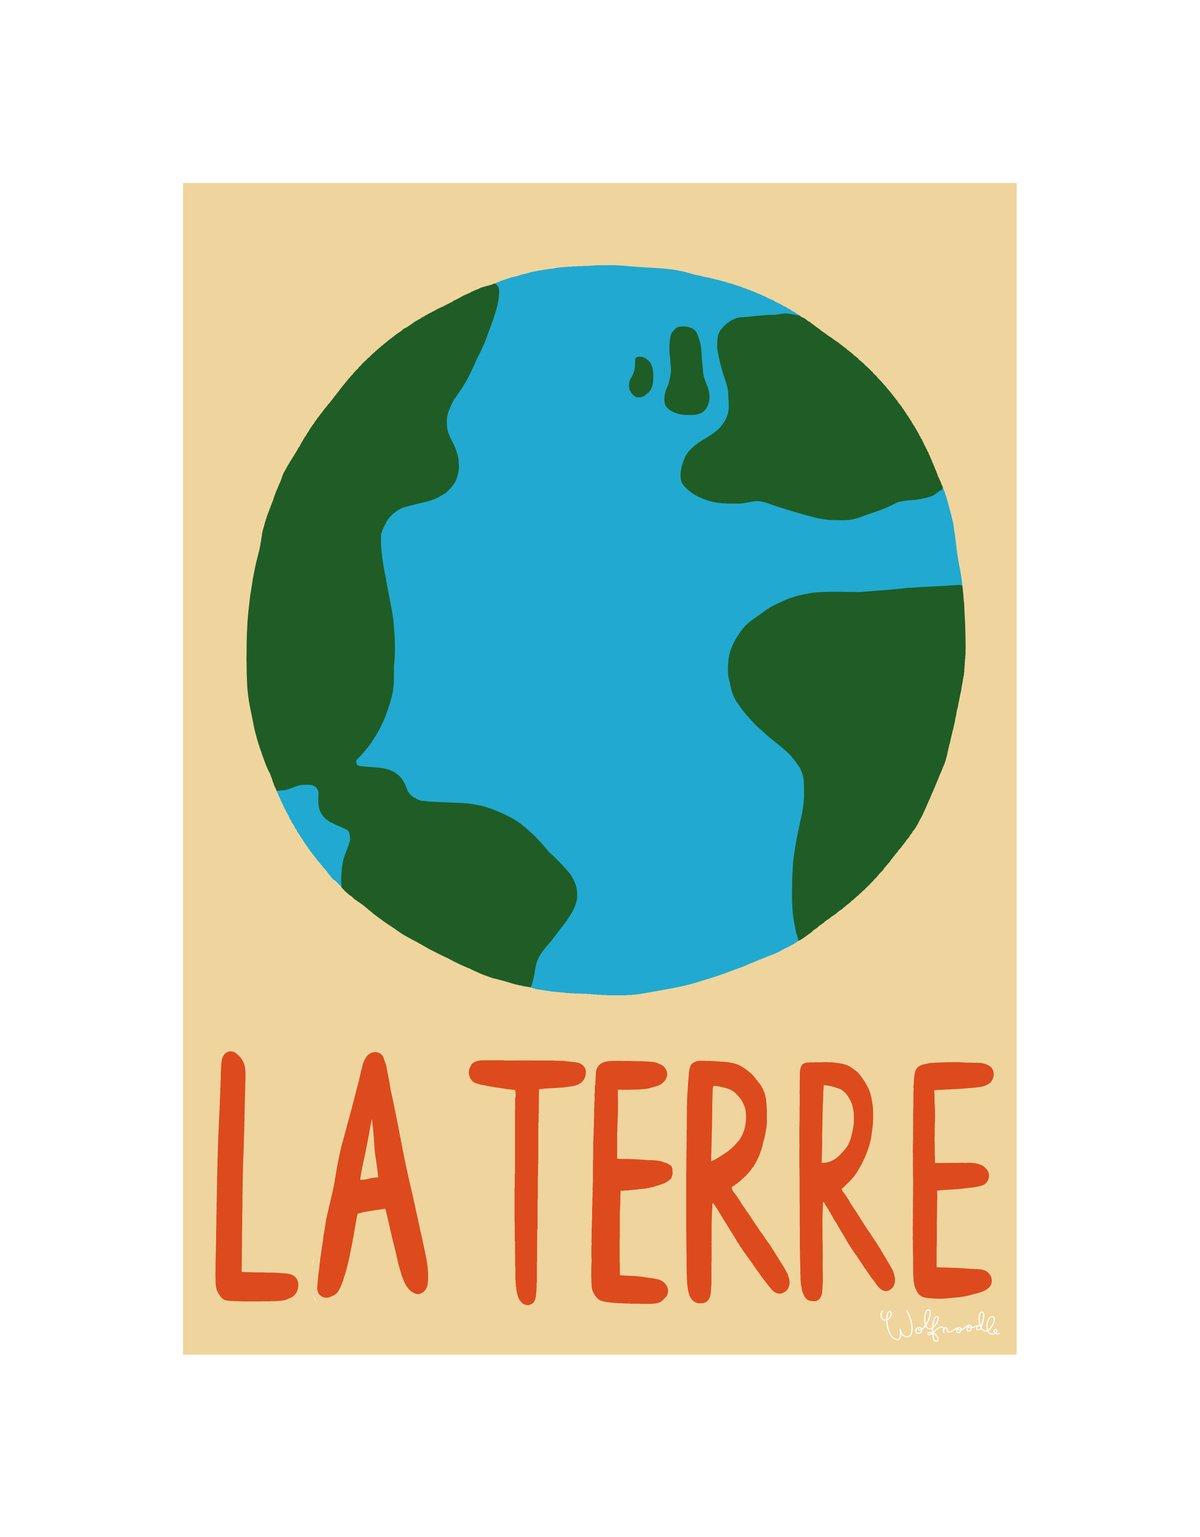 Image of La terre